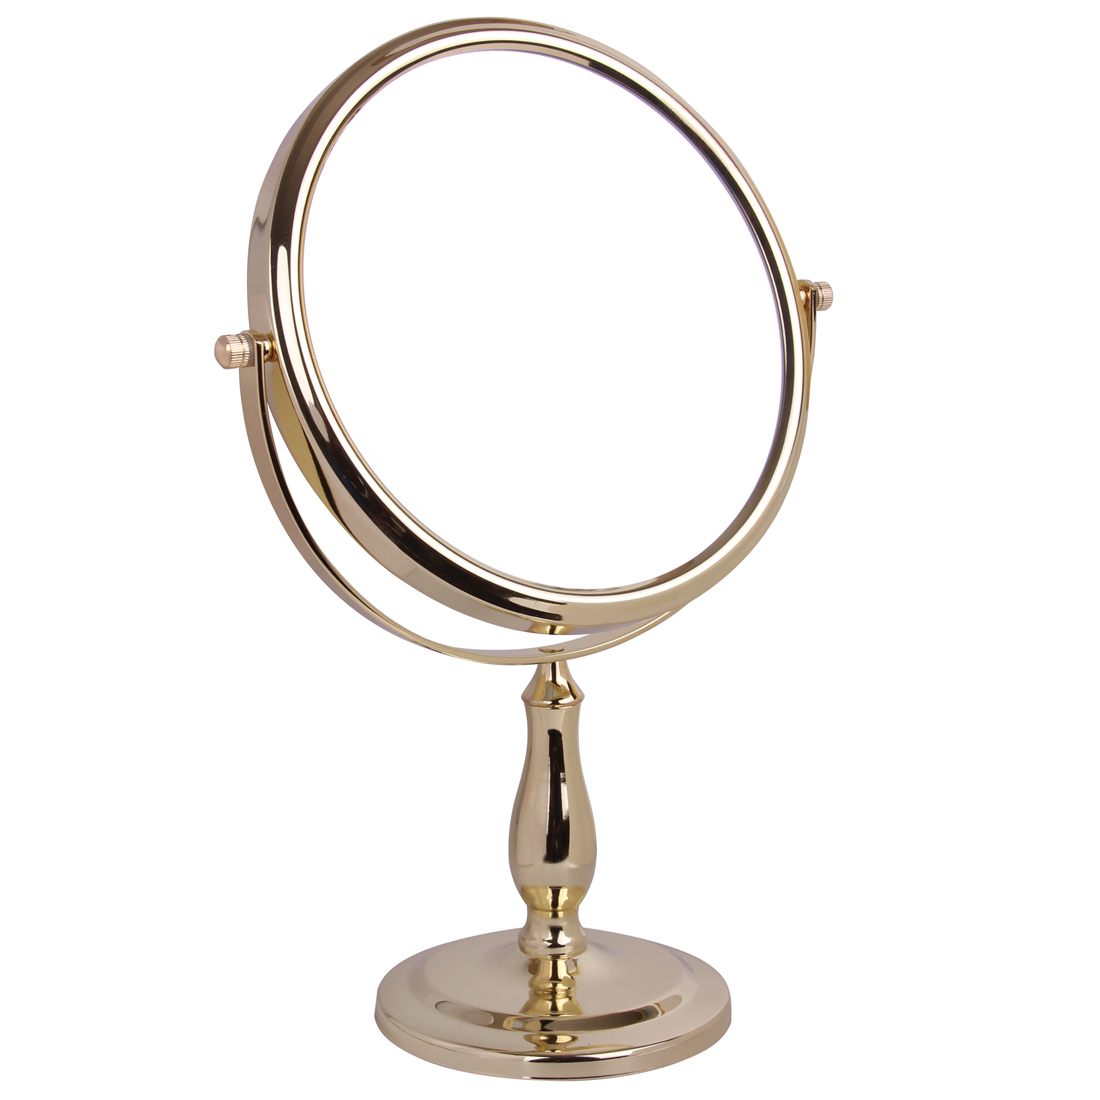 5x Magnification Pedestal Mirror - 5518/20GOLD